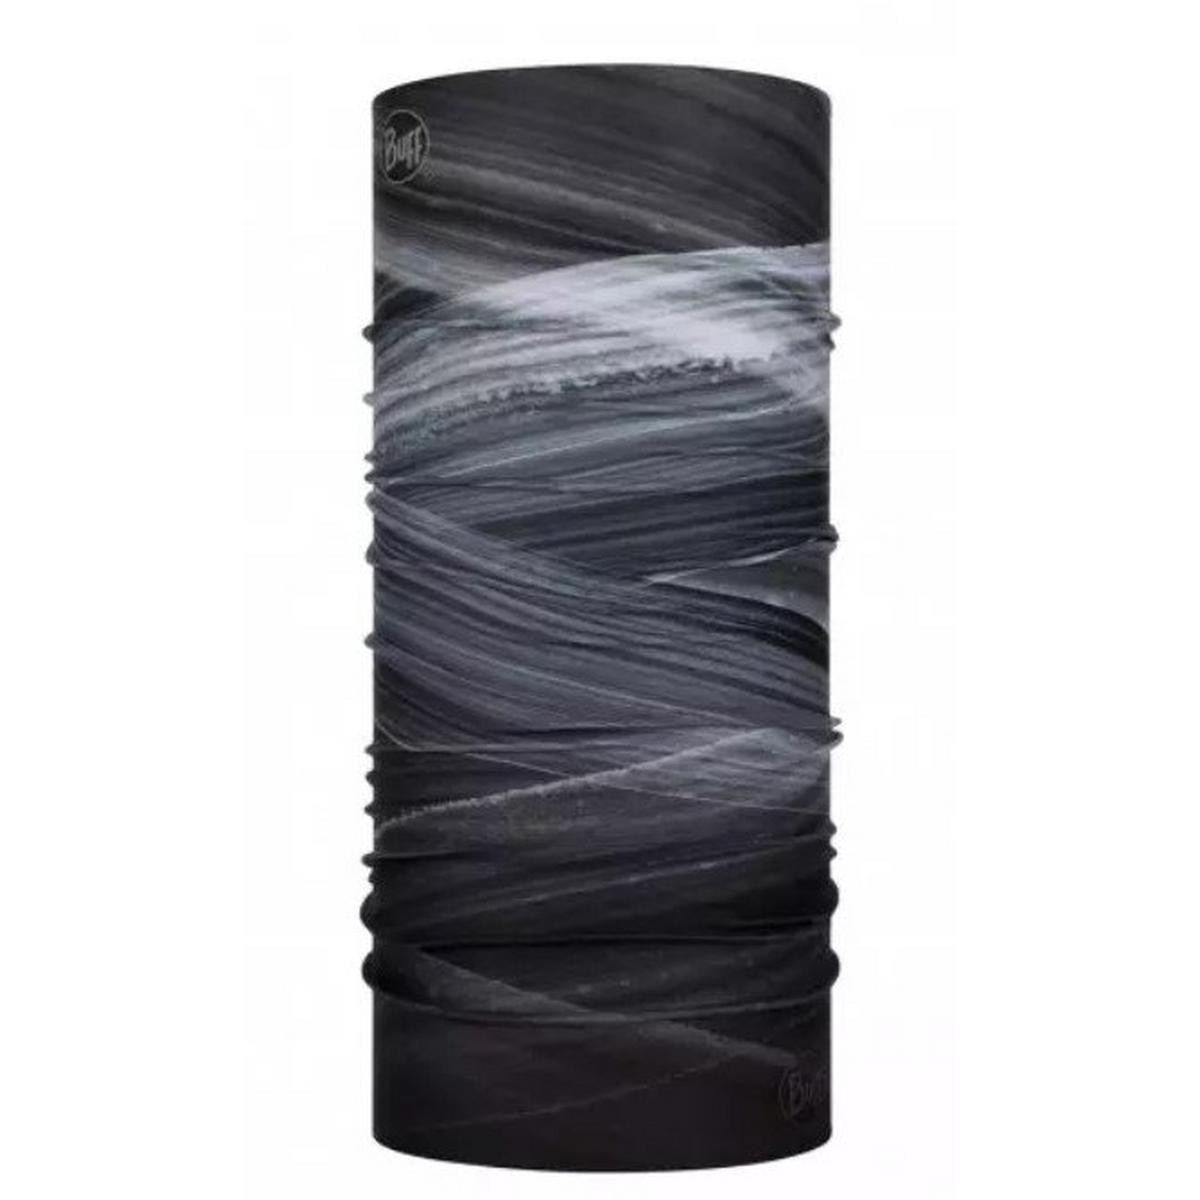 Buff Unisex Original Buff - Black